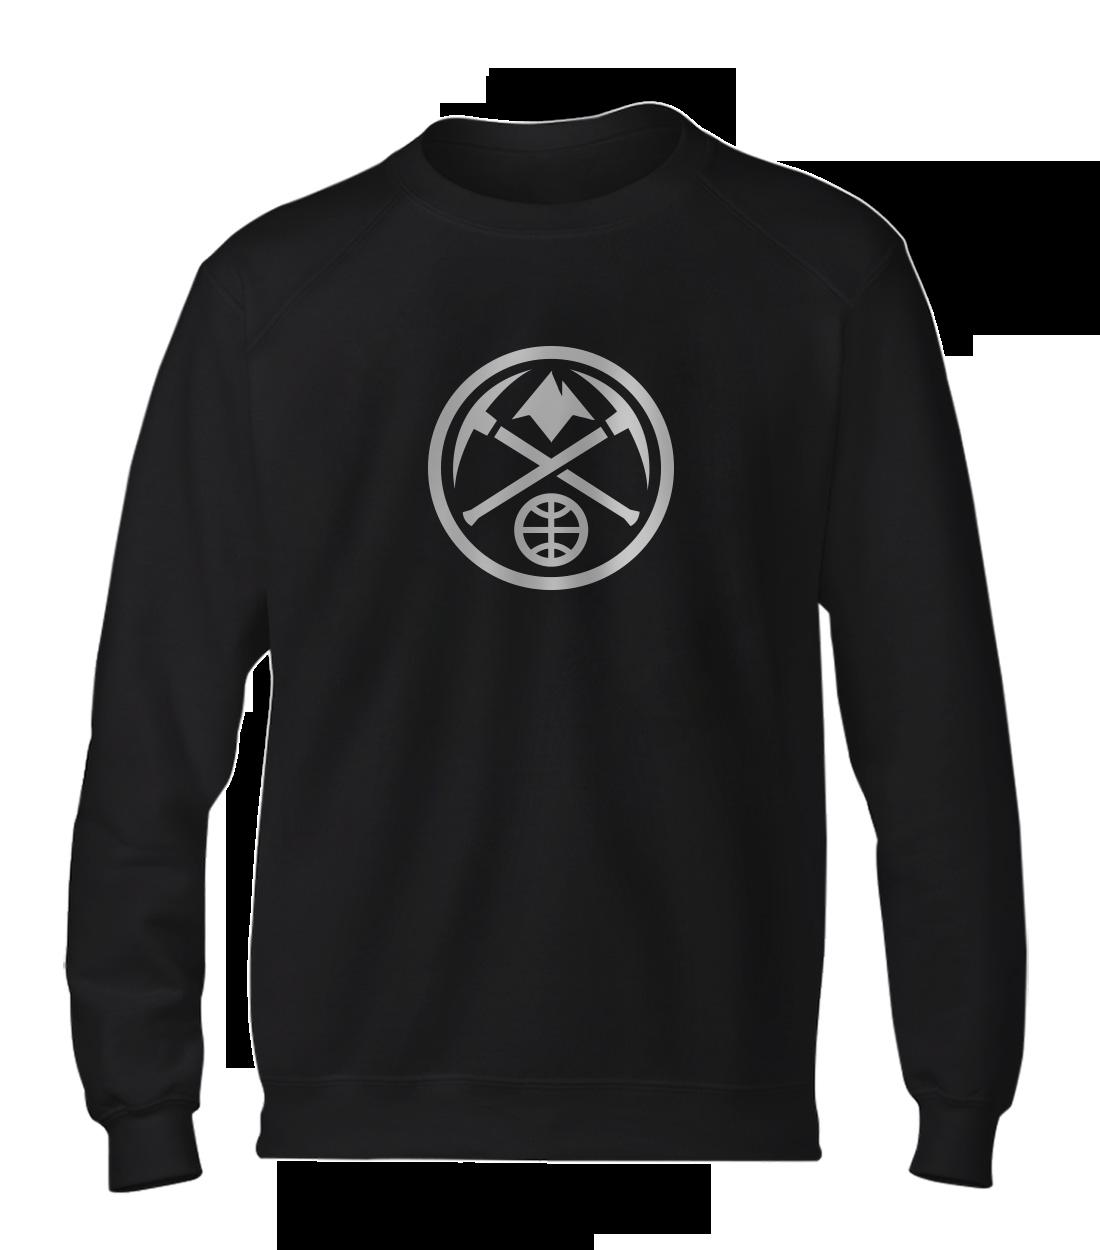 Denver Nuggets Logo Basic (BSC-BLC-341-NBA-NUGGETS-LOGO-WHT)